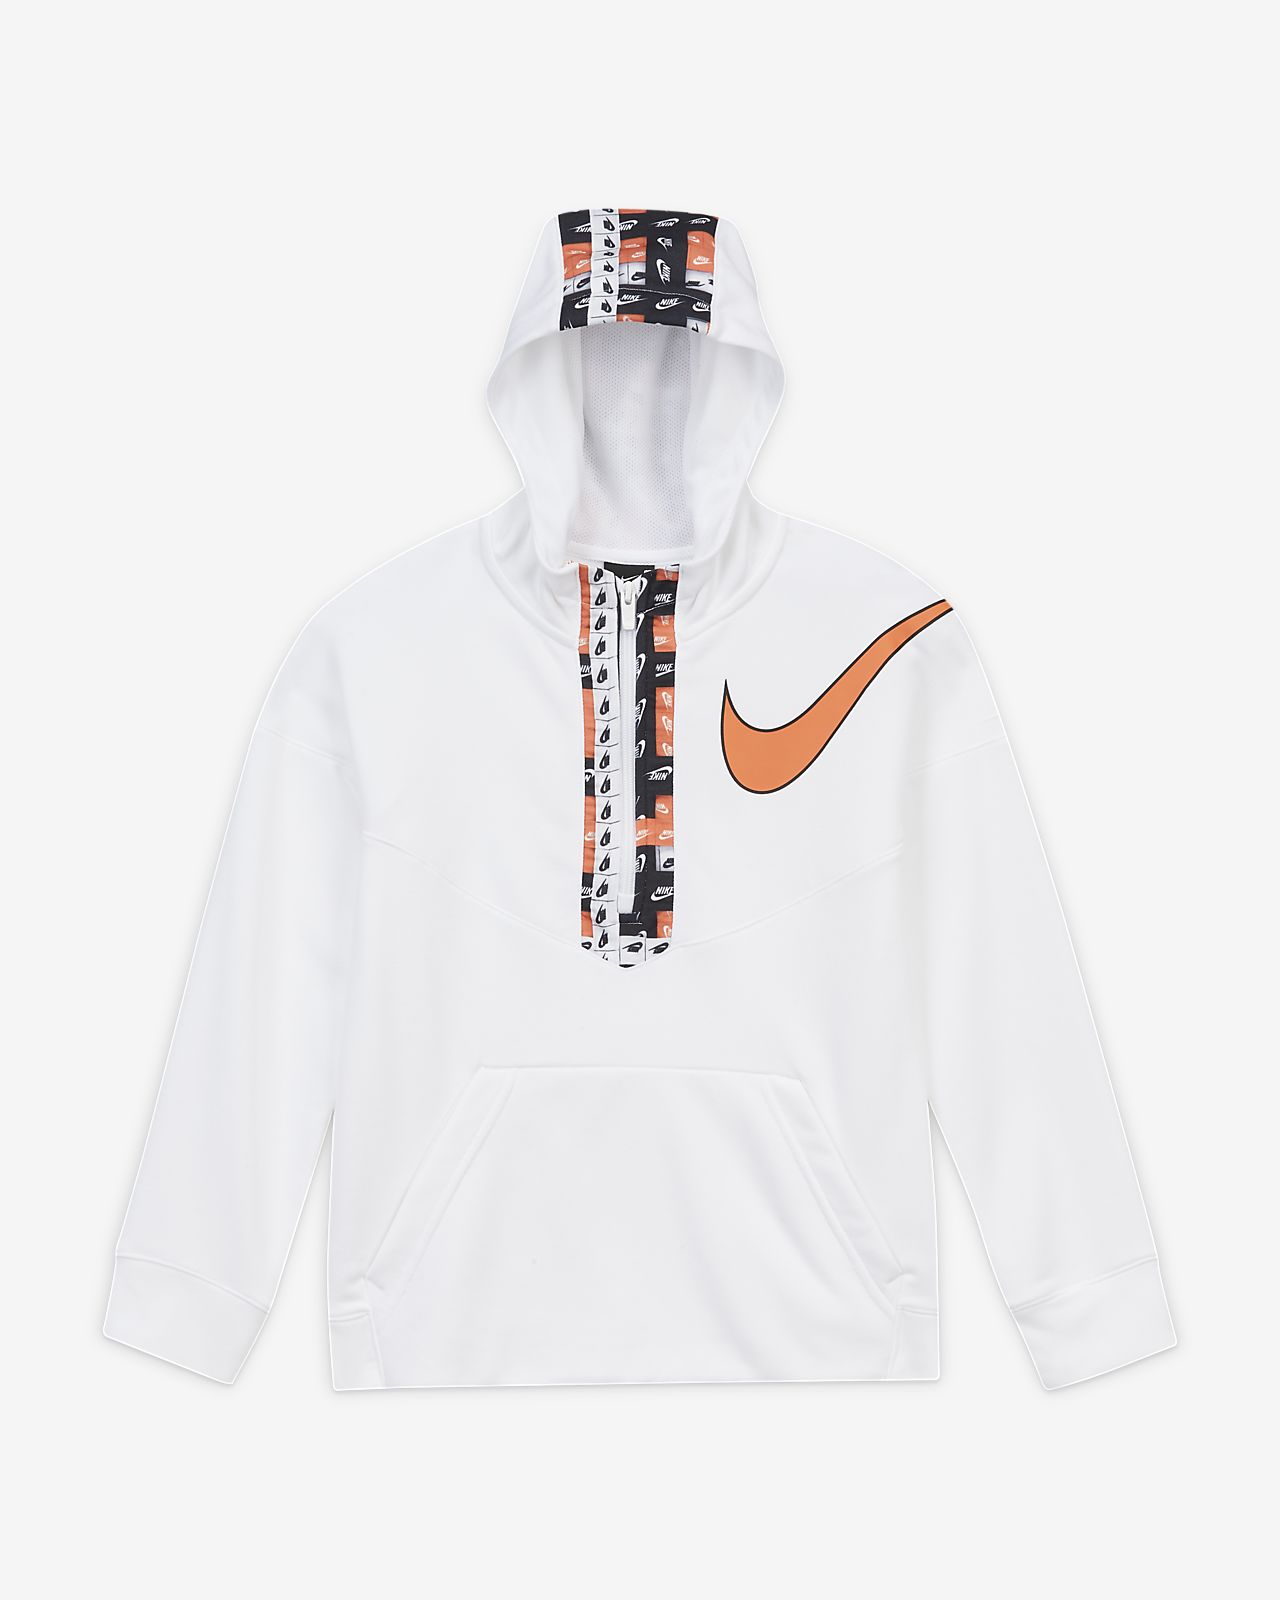 Nike Dri-FIT 大童 (男童) 圖樣半長式拉鍊訓練連帽上衣